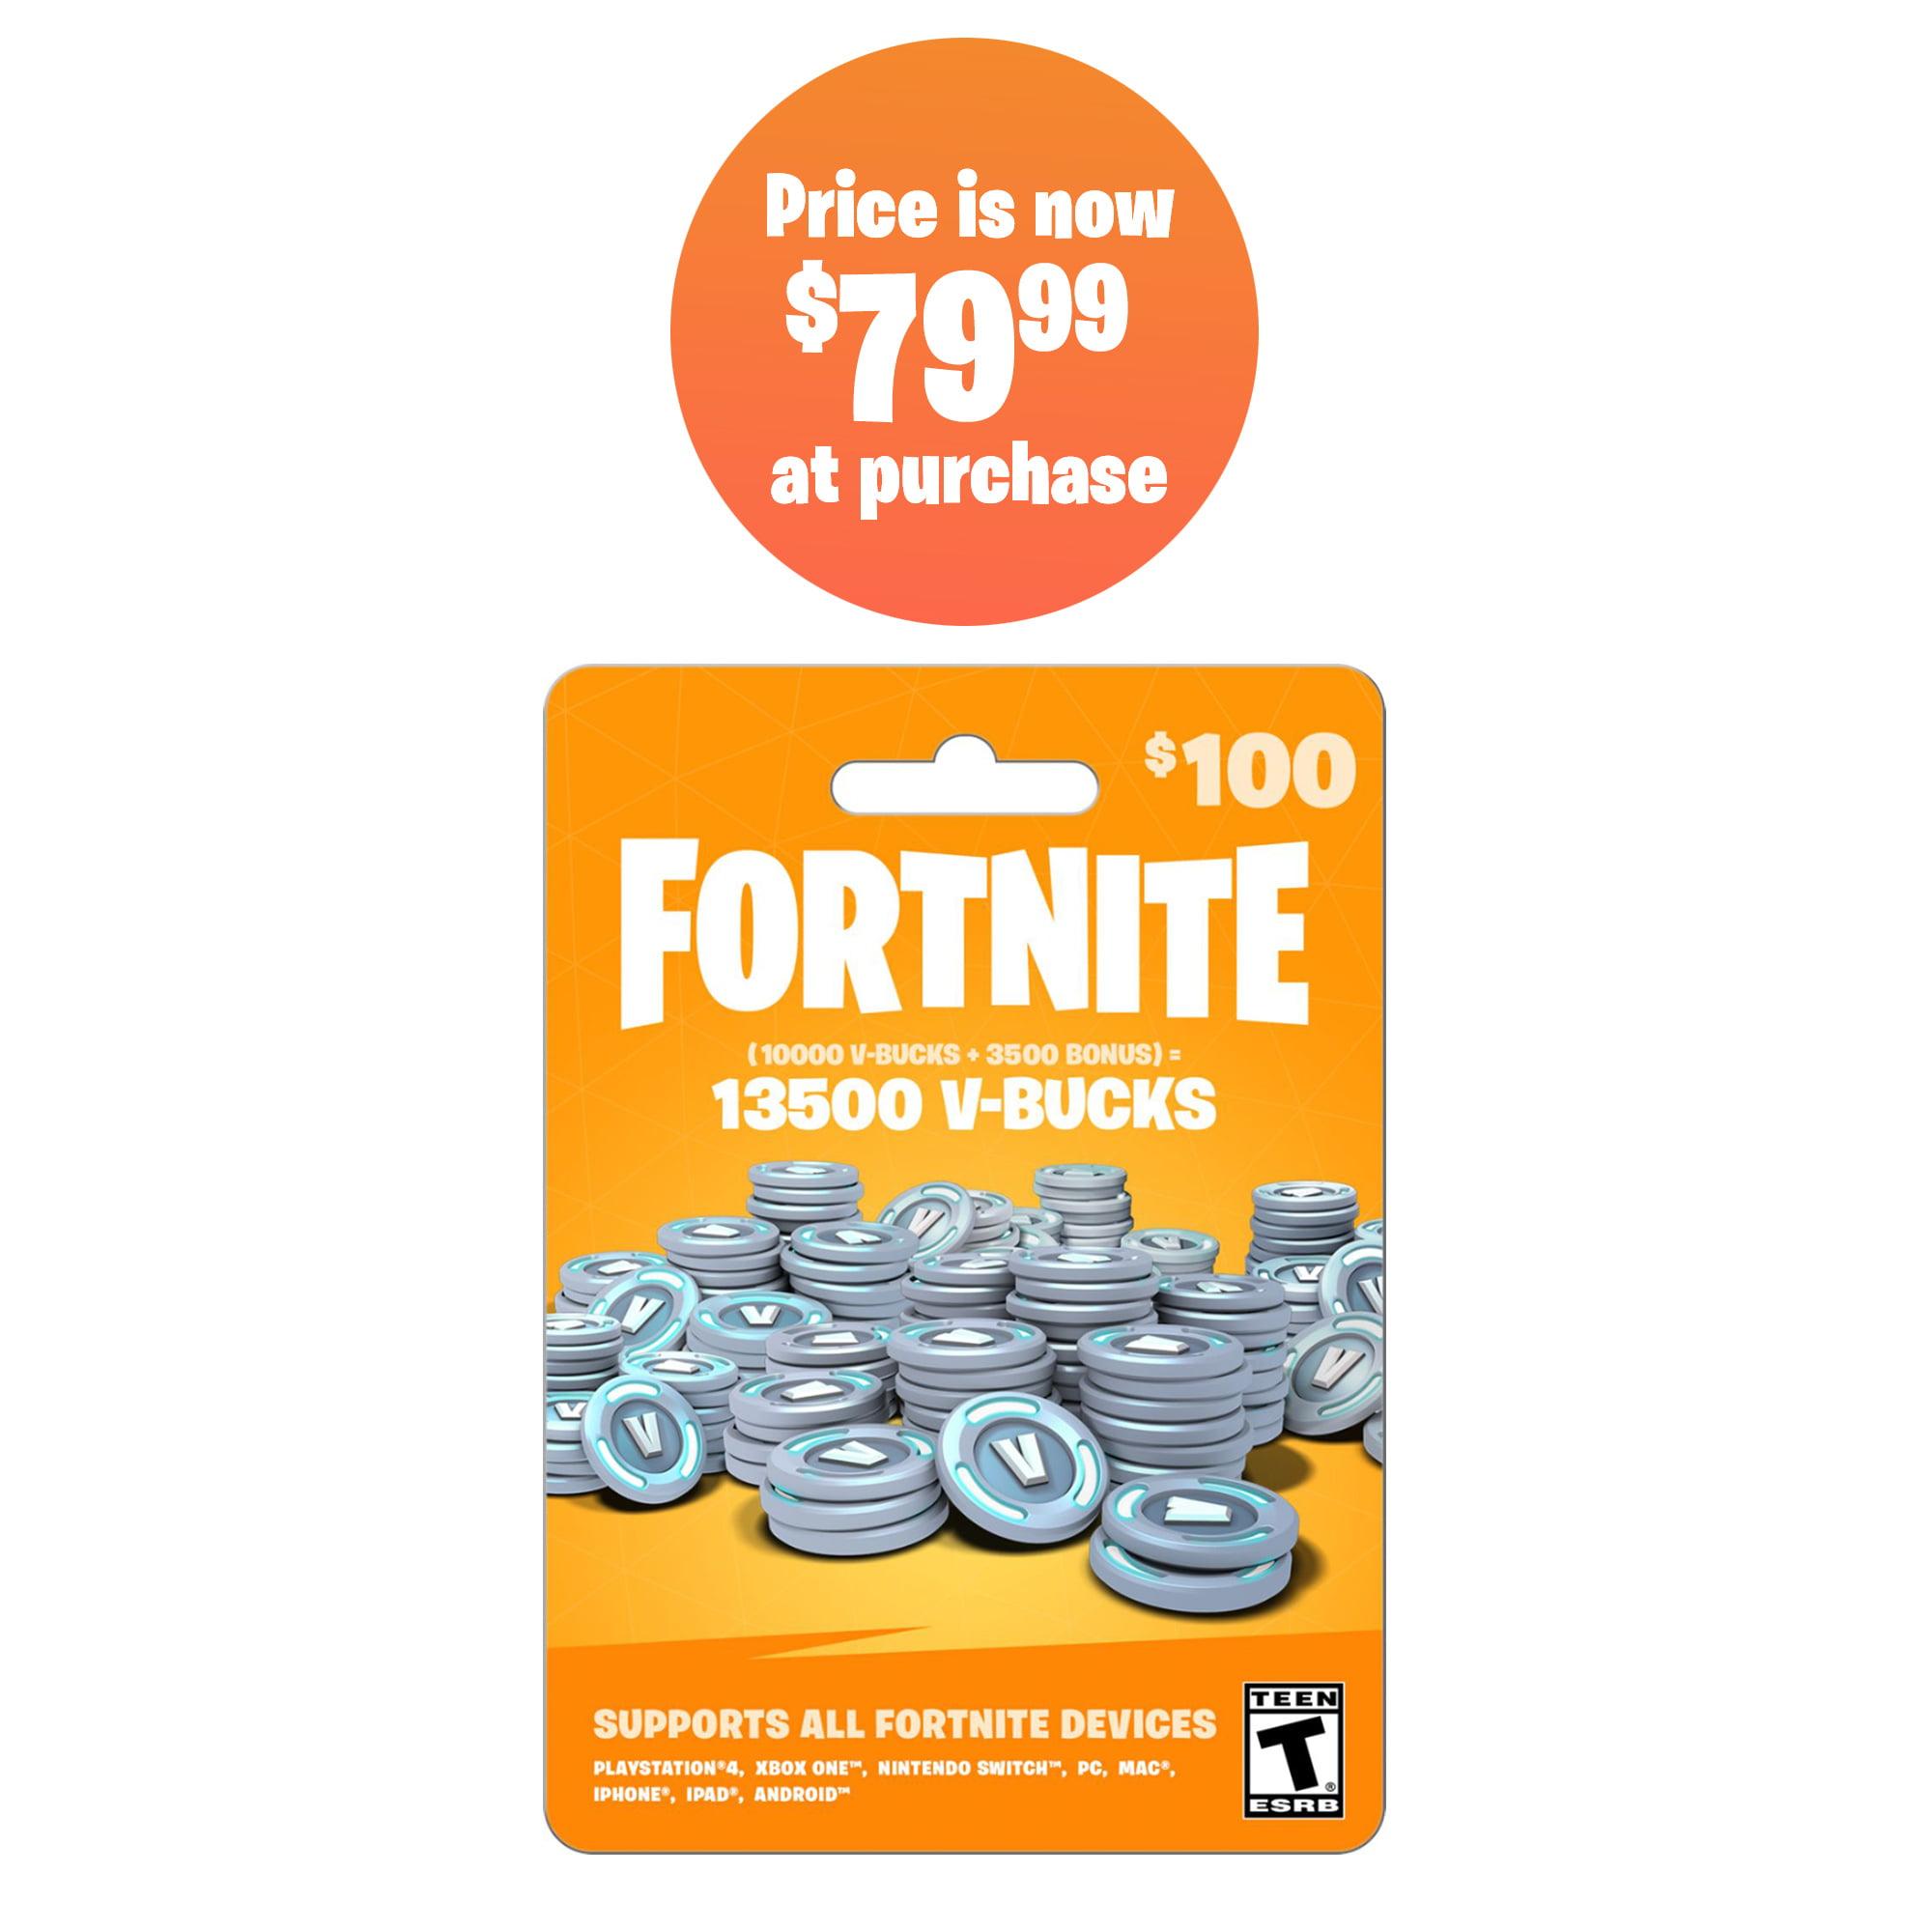 Fortnite V Buckscheap Gearbox Fortnite 59 77 Physical Gift Cards 3 Pack Of 19 99 Cards 8 400 V Bucks For All Devices Walmart Com Walmart Com